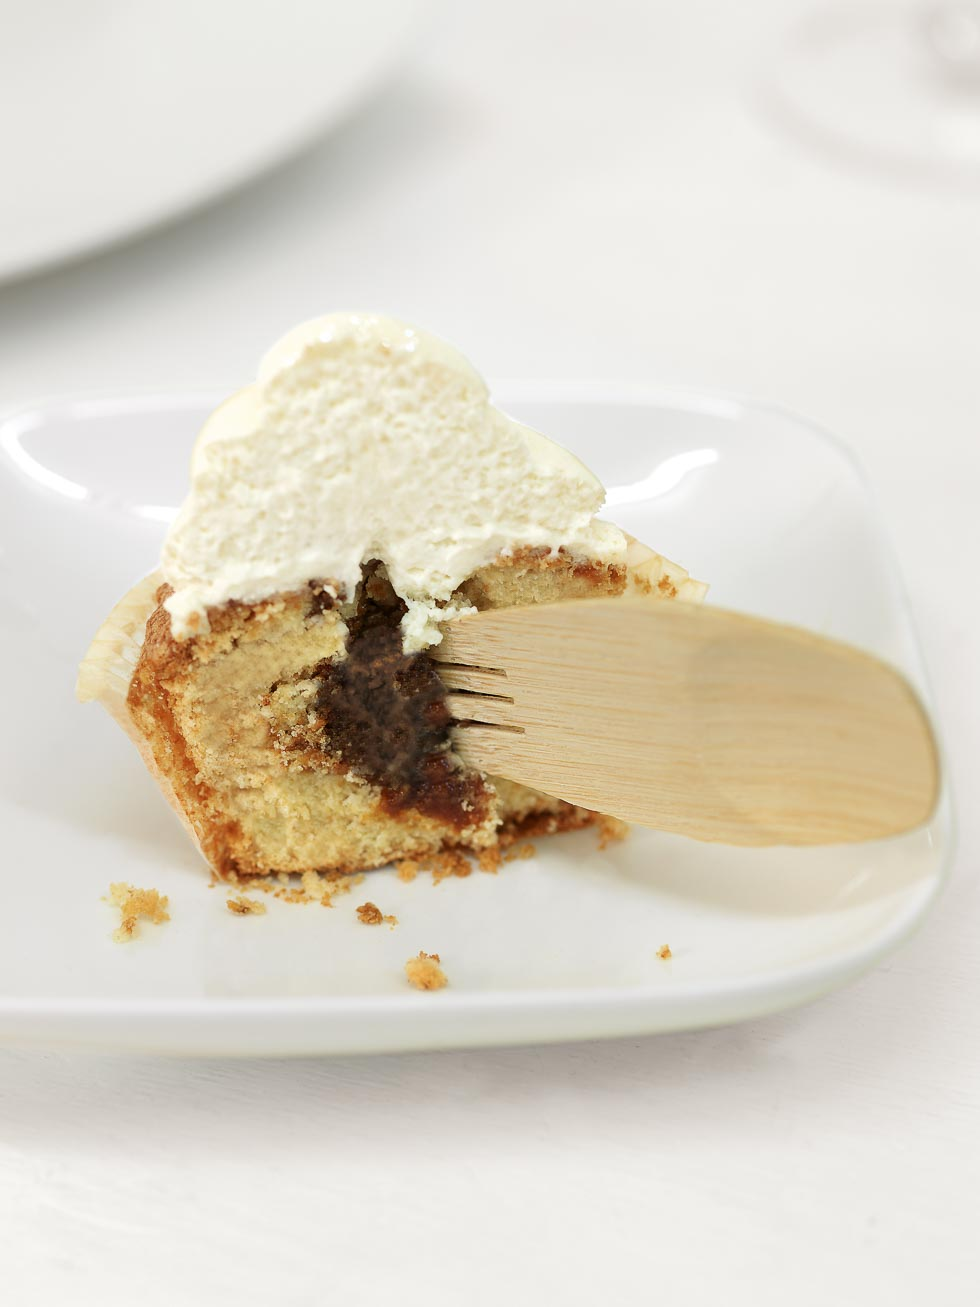 Desserytable Mamormuffin